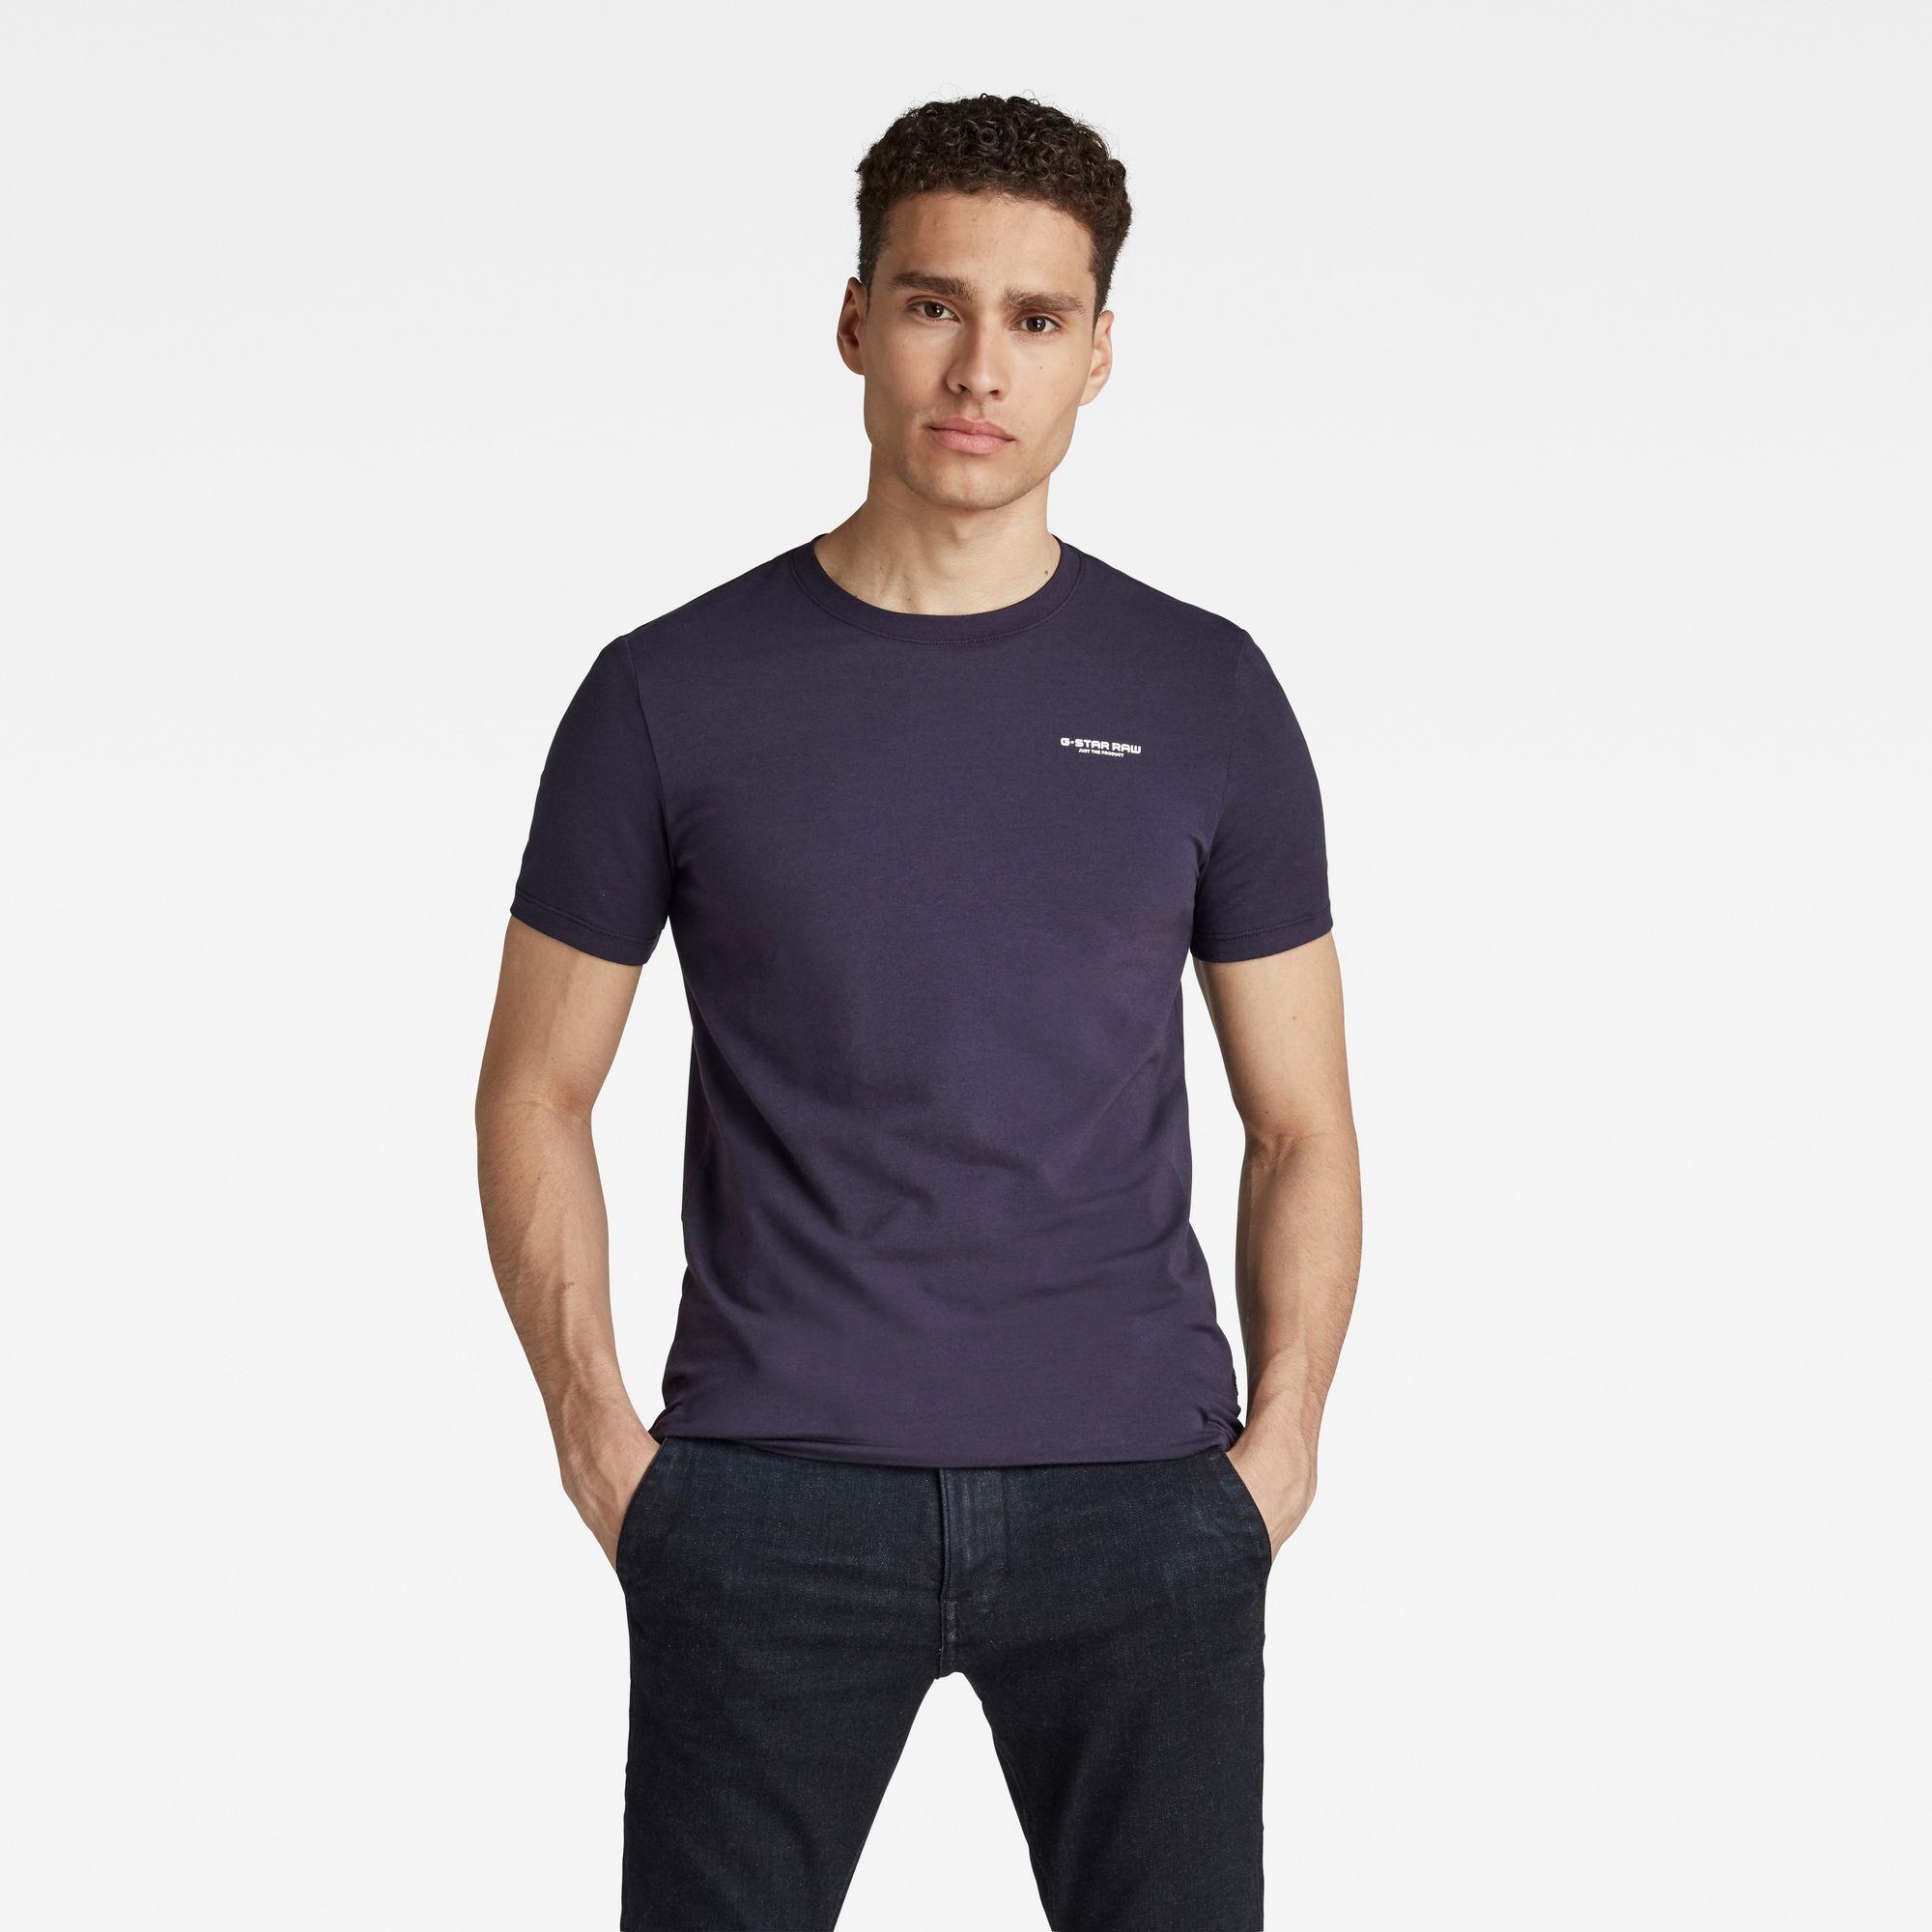 G-Star RAW Hombre Camiseta Slim Base Azul oscuro